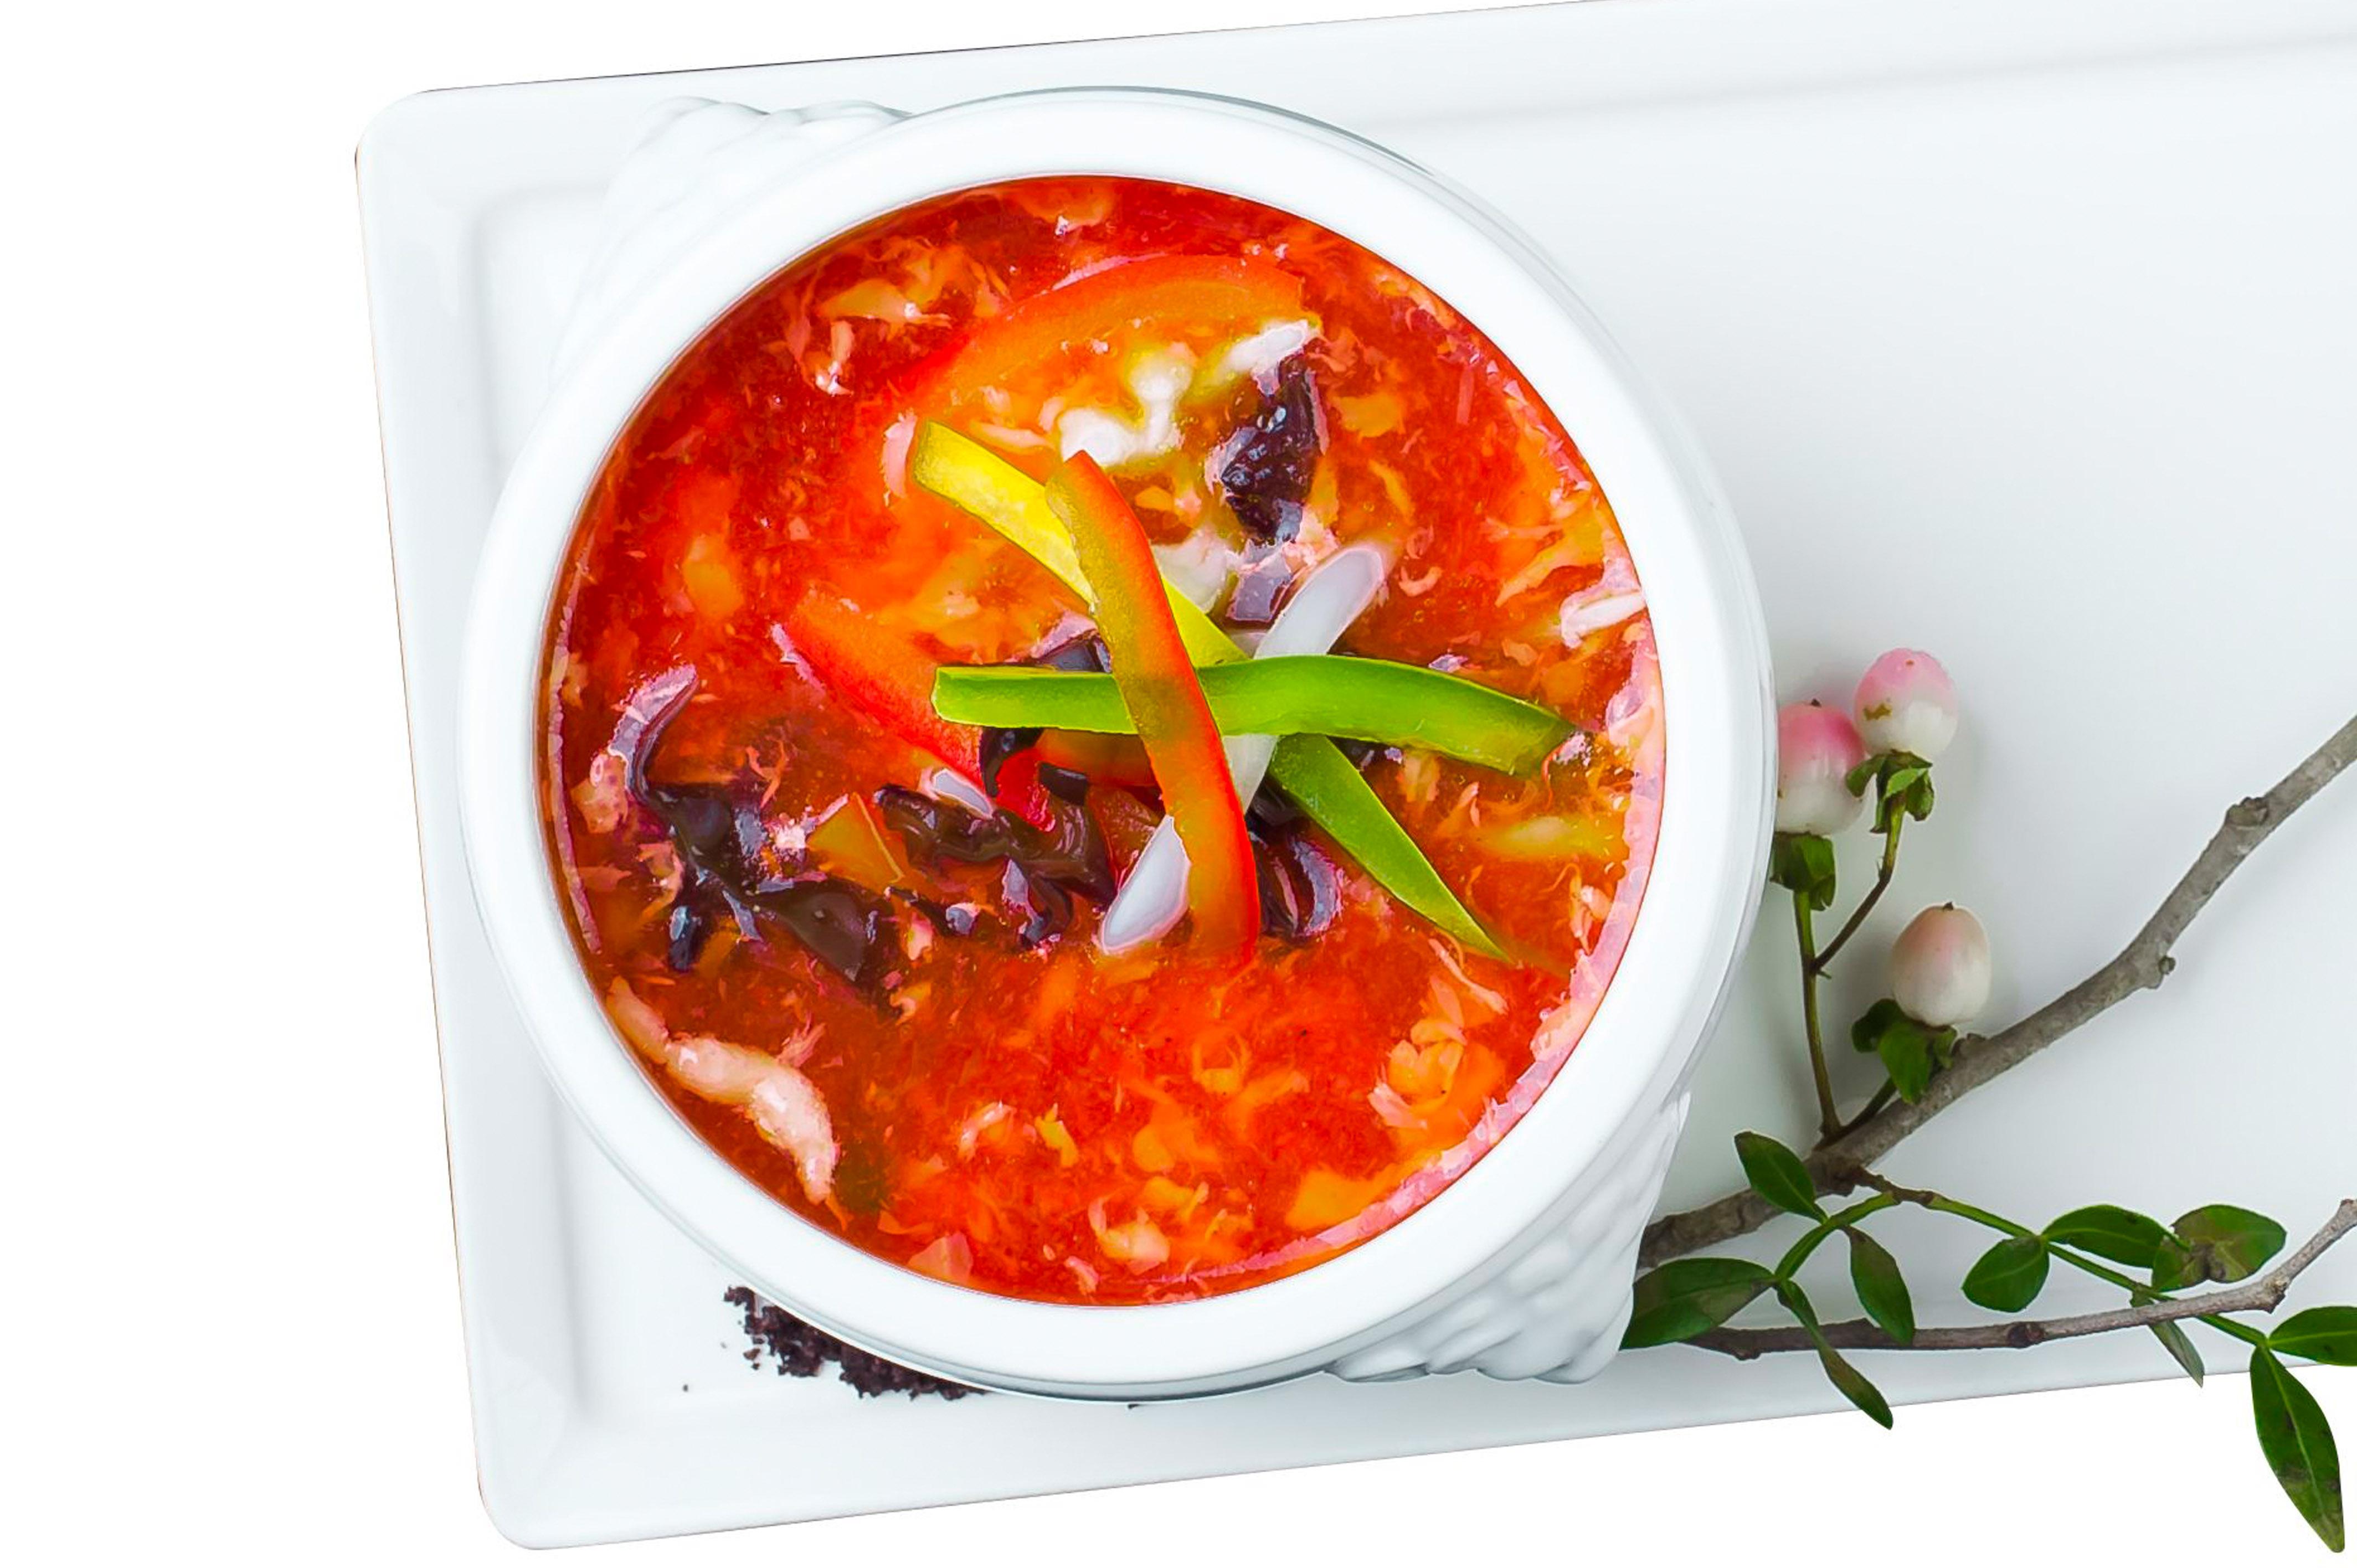 Кисло-острый суп по-сычуаньски